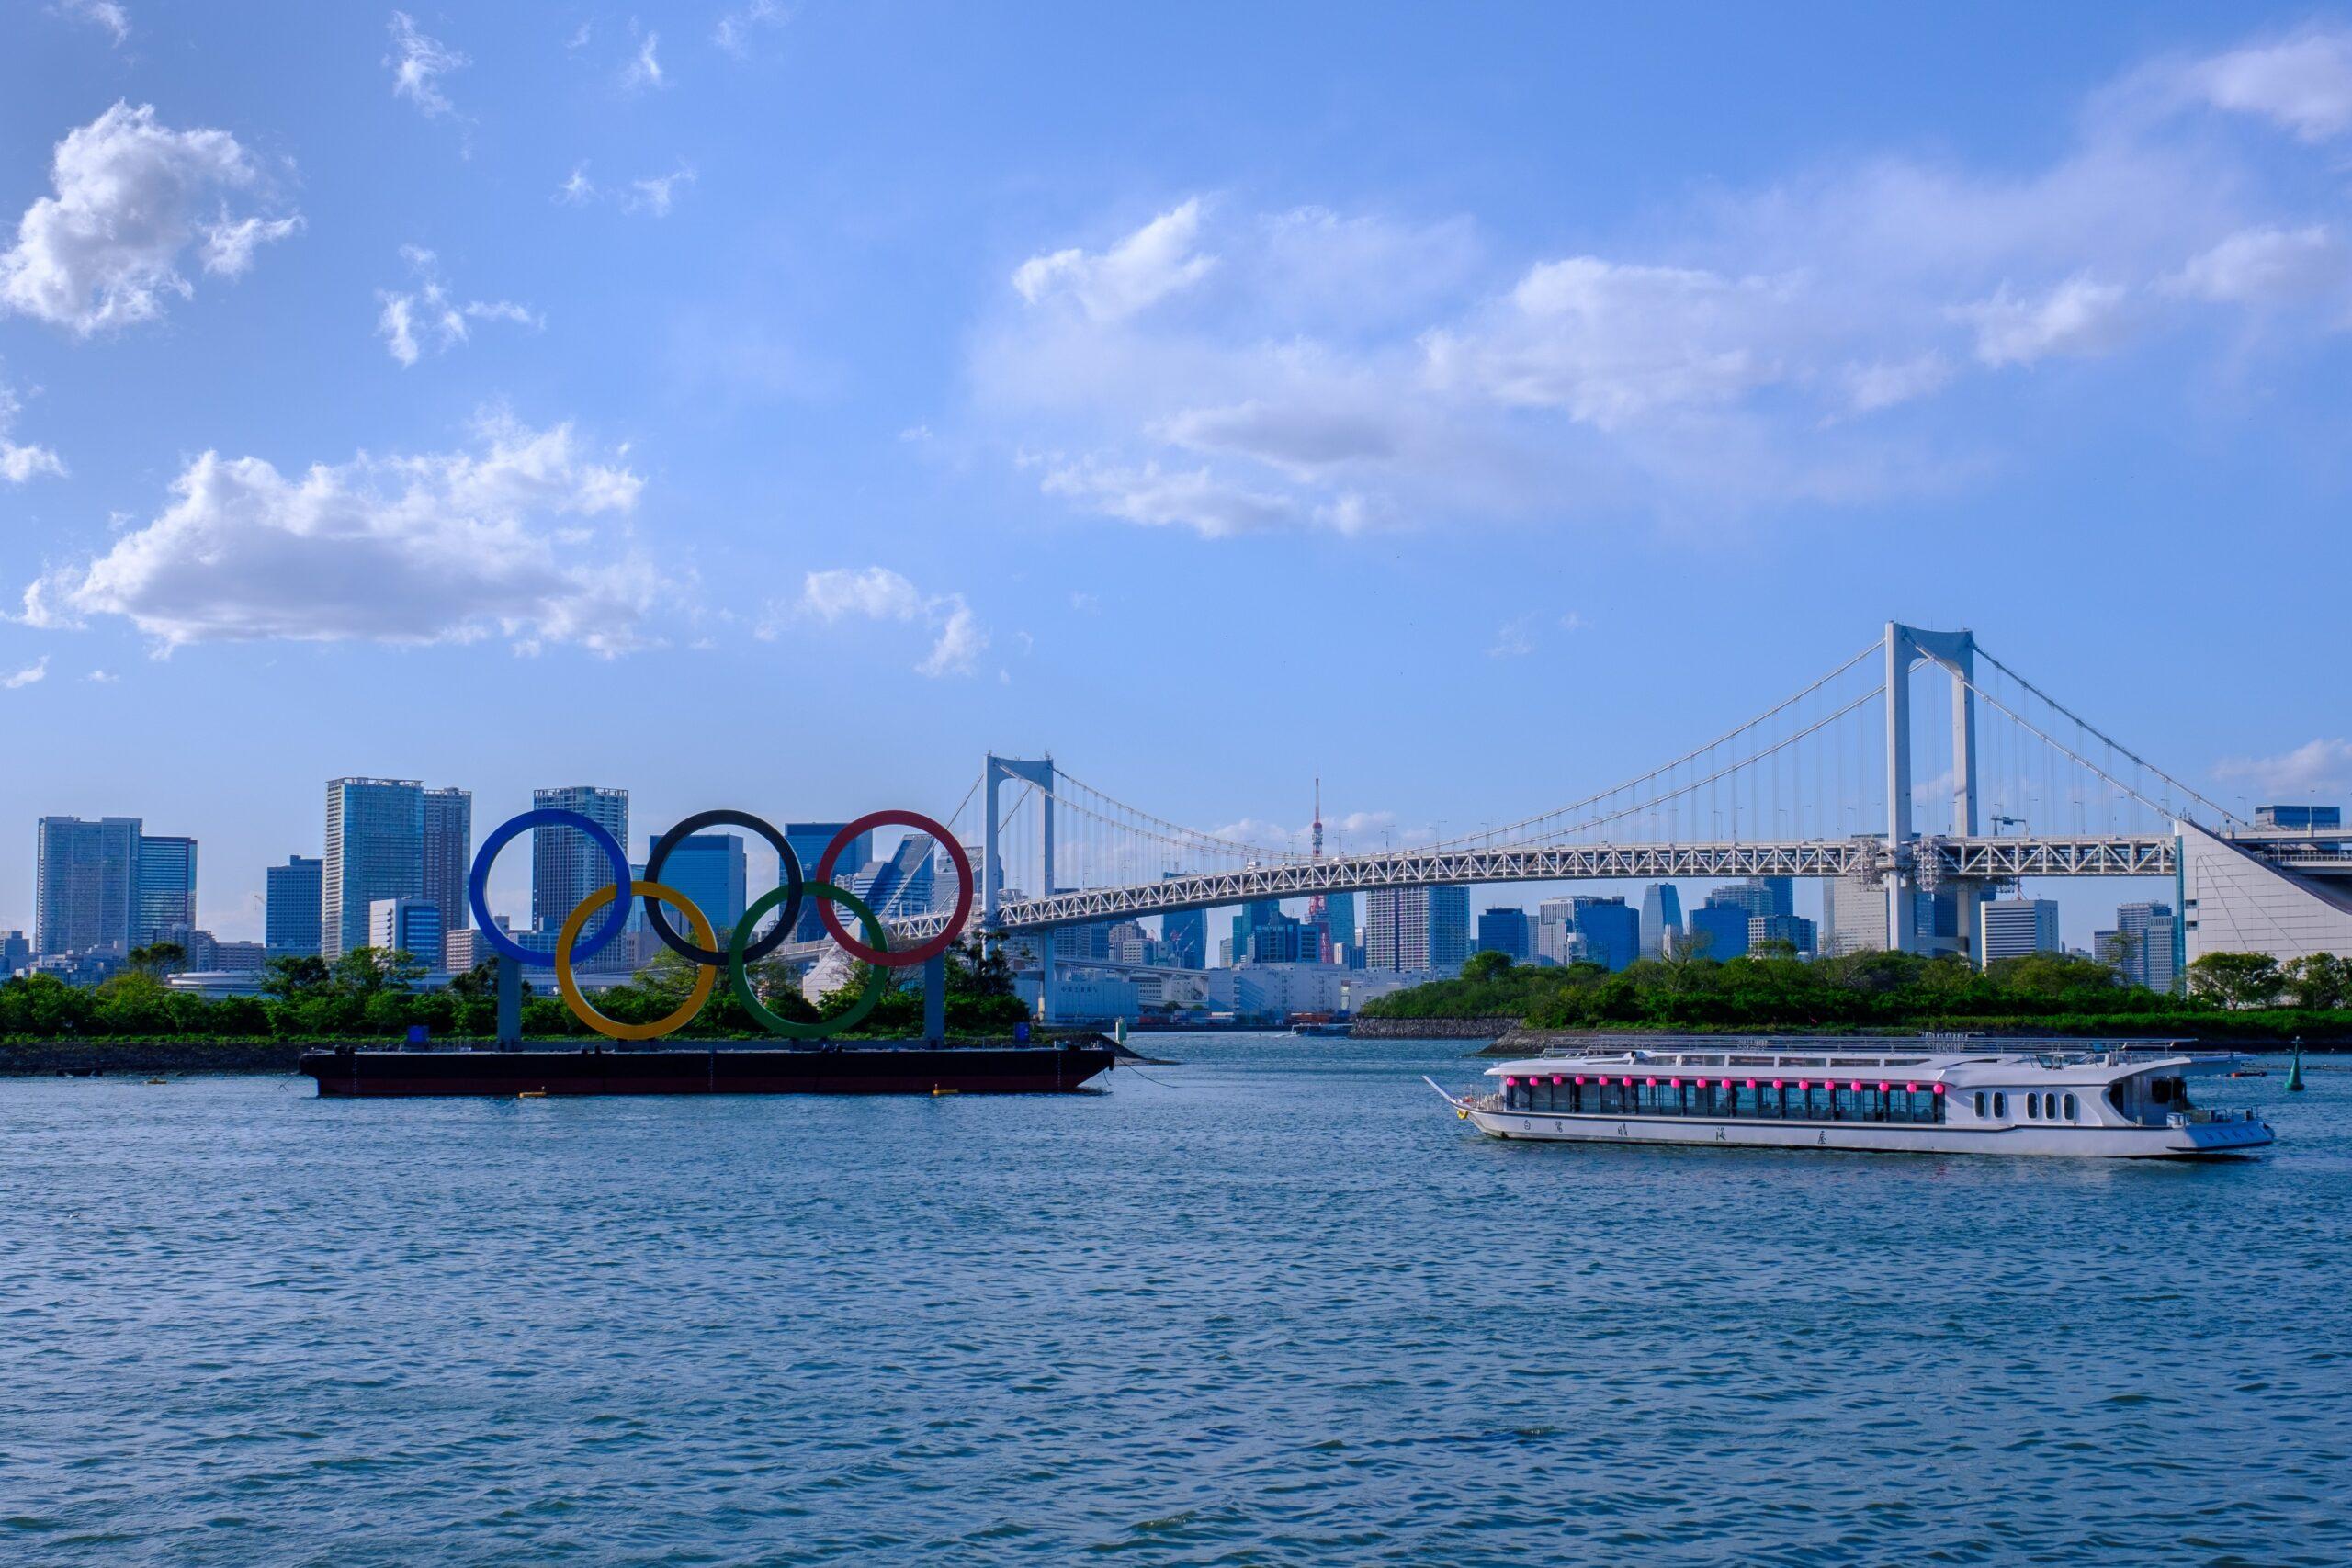 Olympics public liability